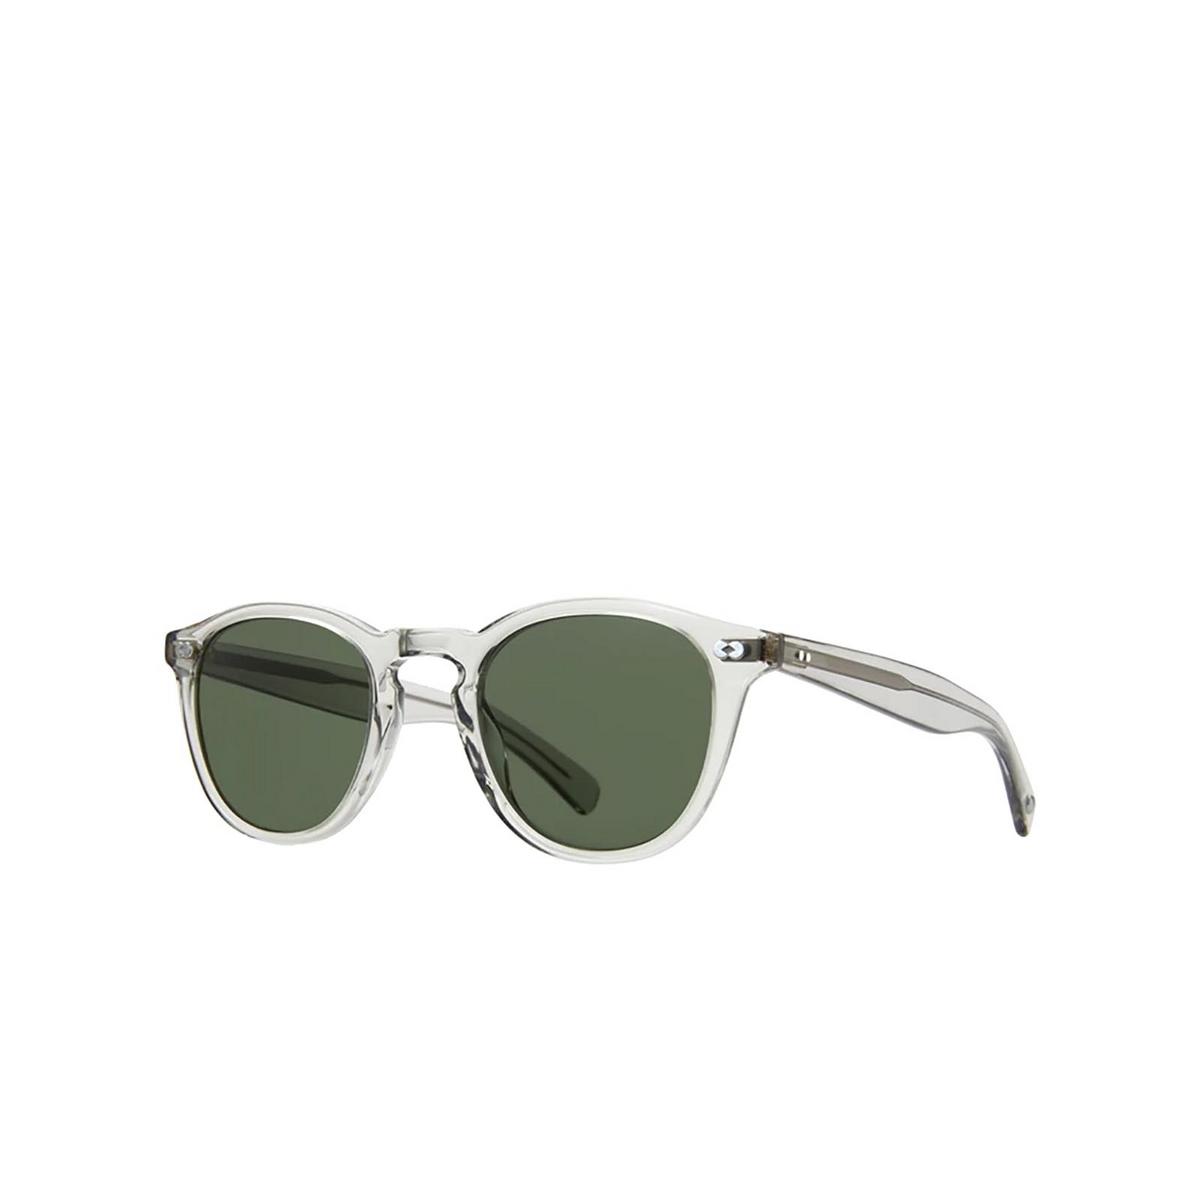 Garrett Leight® Square Sunglasses: Hampton X Sun color Llg LLG/PG15.